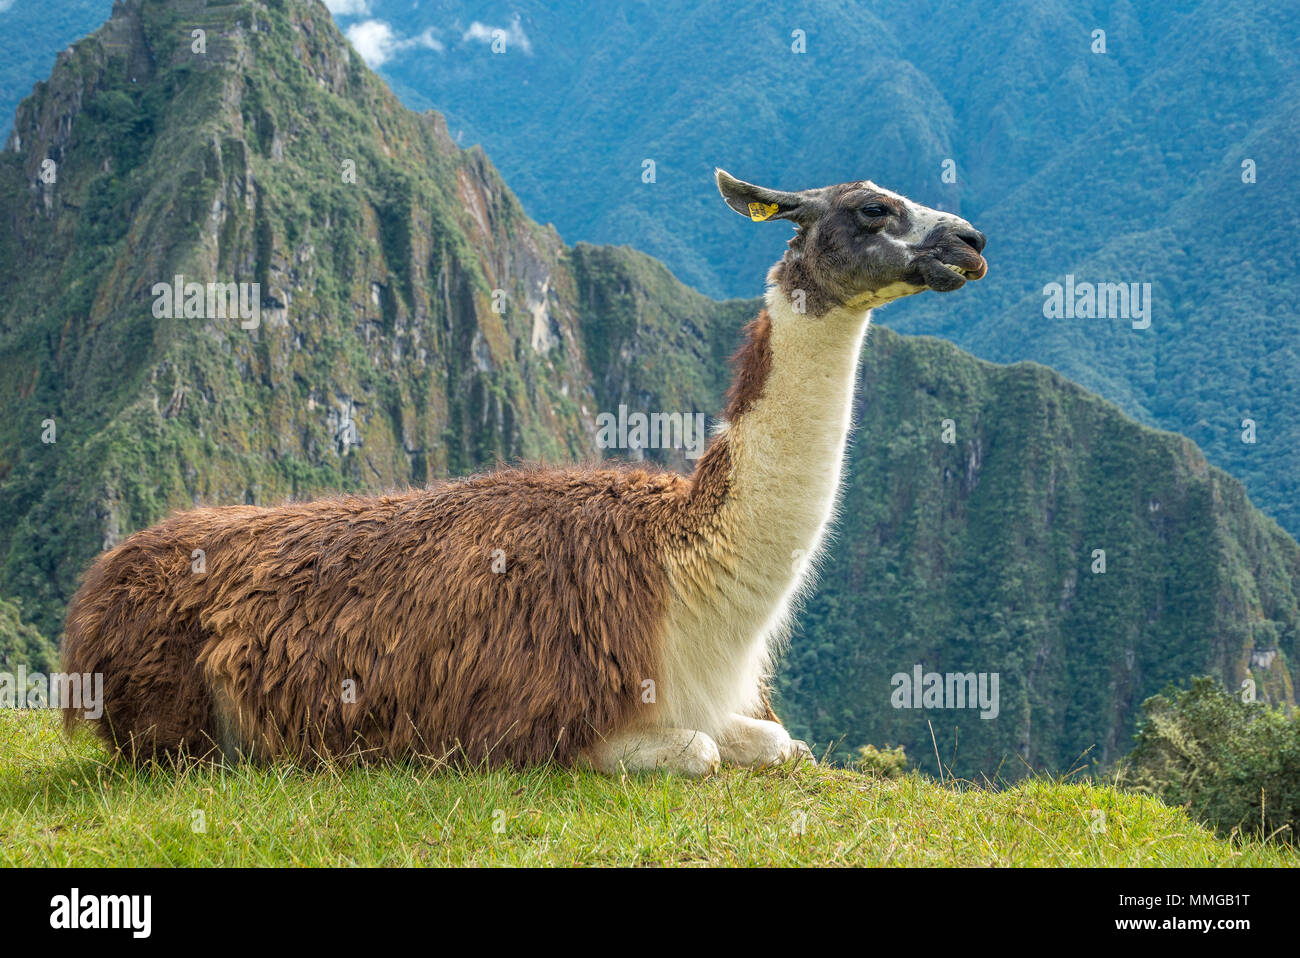 Llama in Machu Picchu with beautiful landscape behind - Stock Image